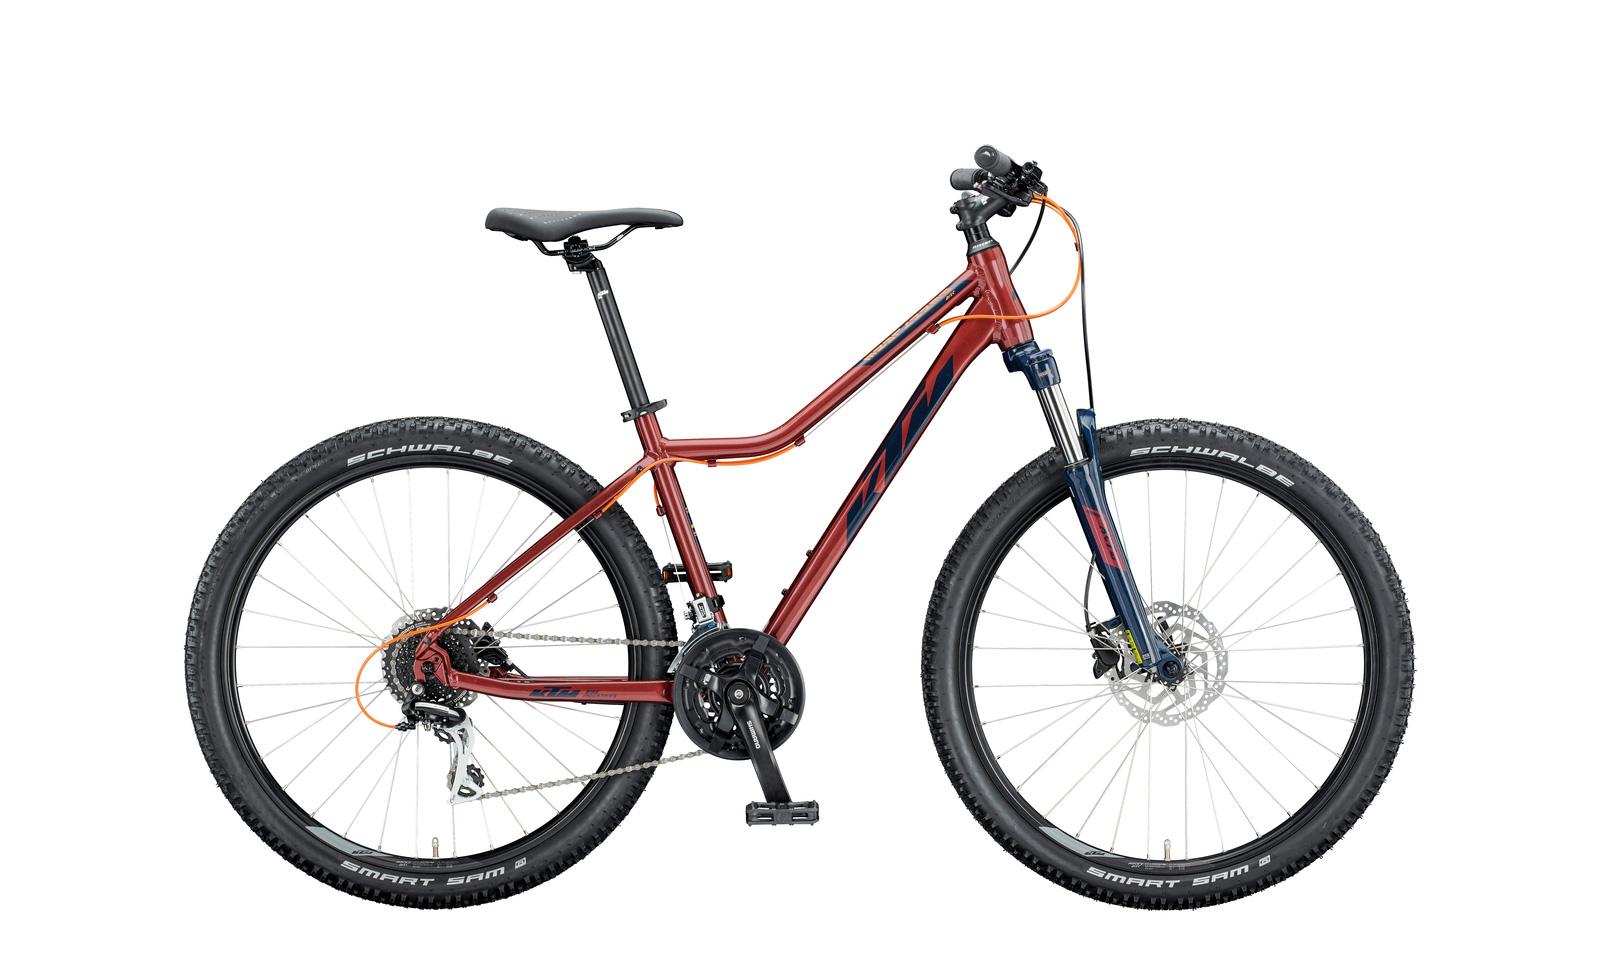 Biciclete KTM MTB Hardtail PENNY LANE DISC-H 27.24 3x8 Shimano Acera